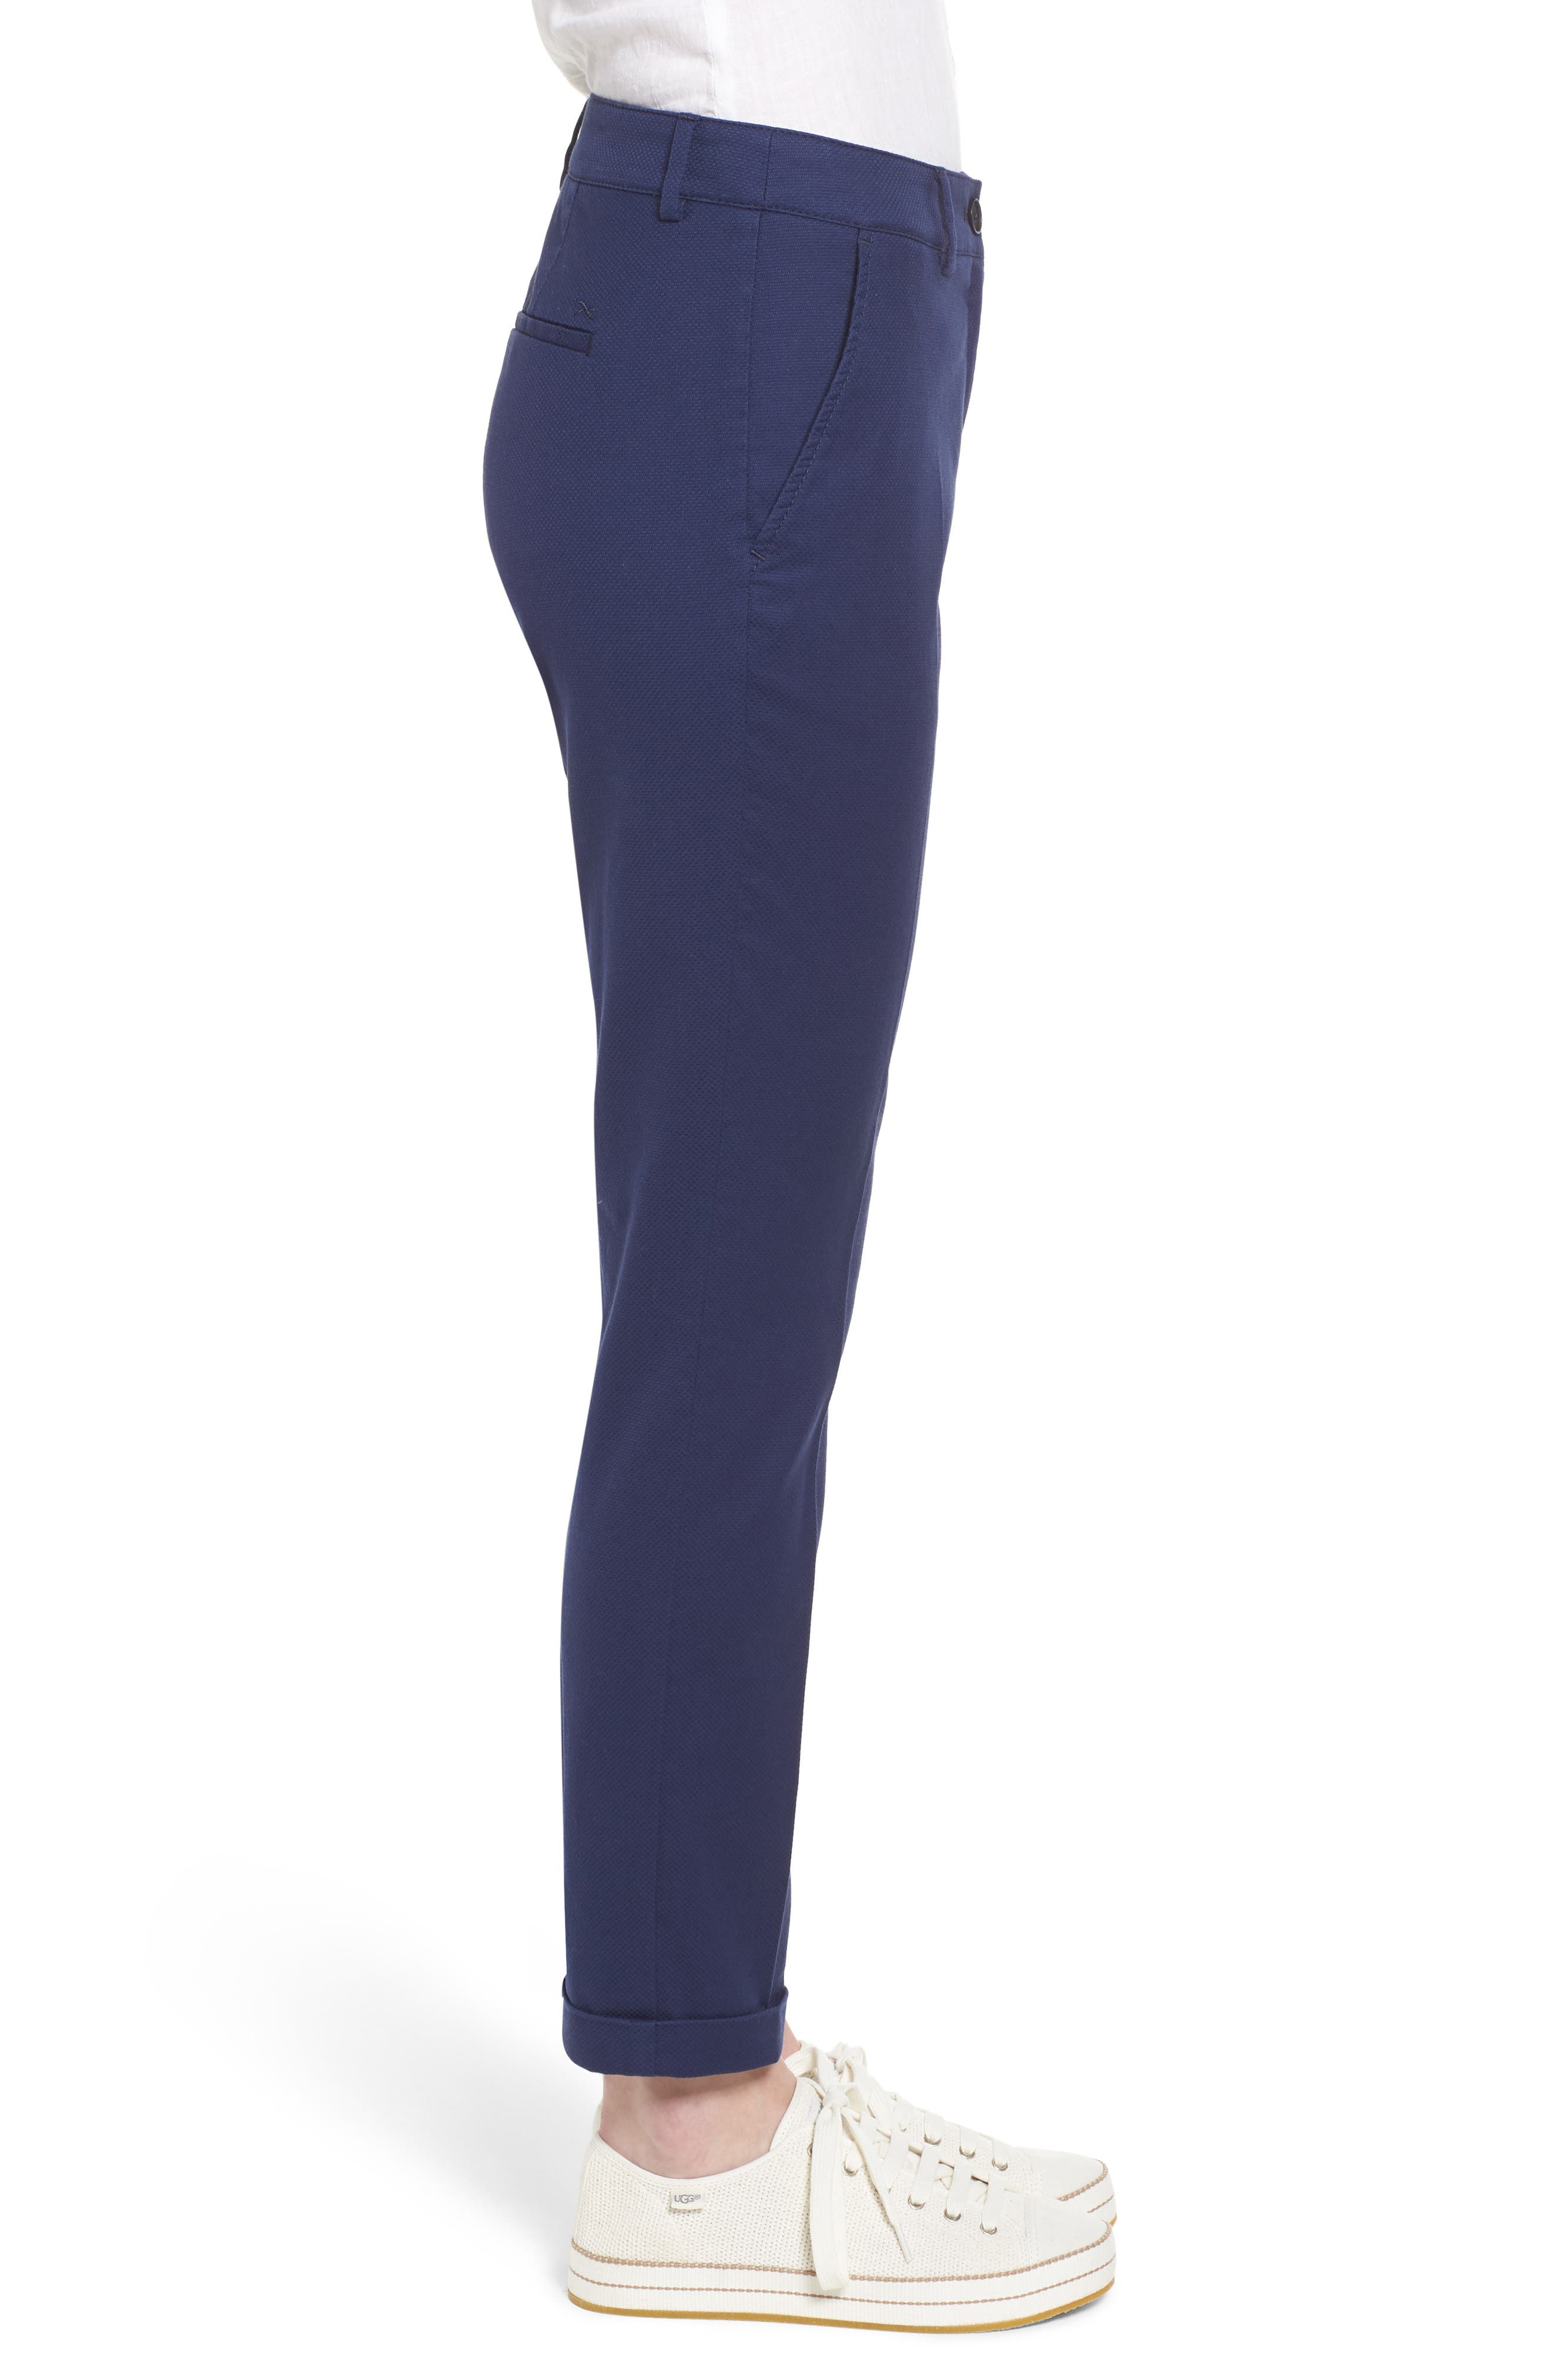 Maron Cuffed Straight Leg Pants,                             Alternate thumbnail 3, color,                             Navy